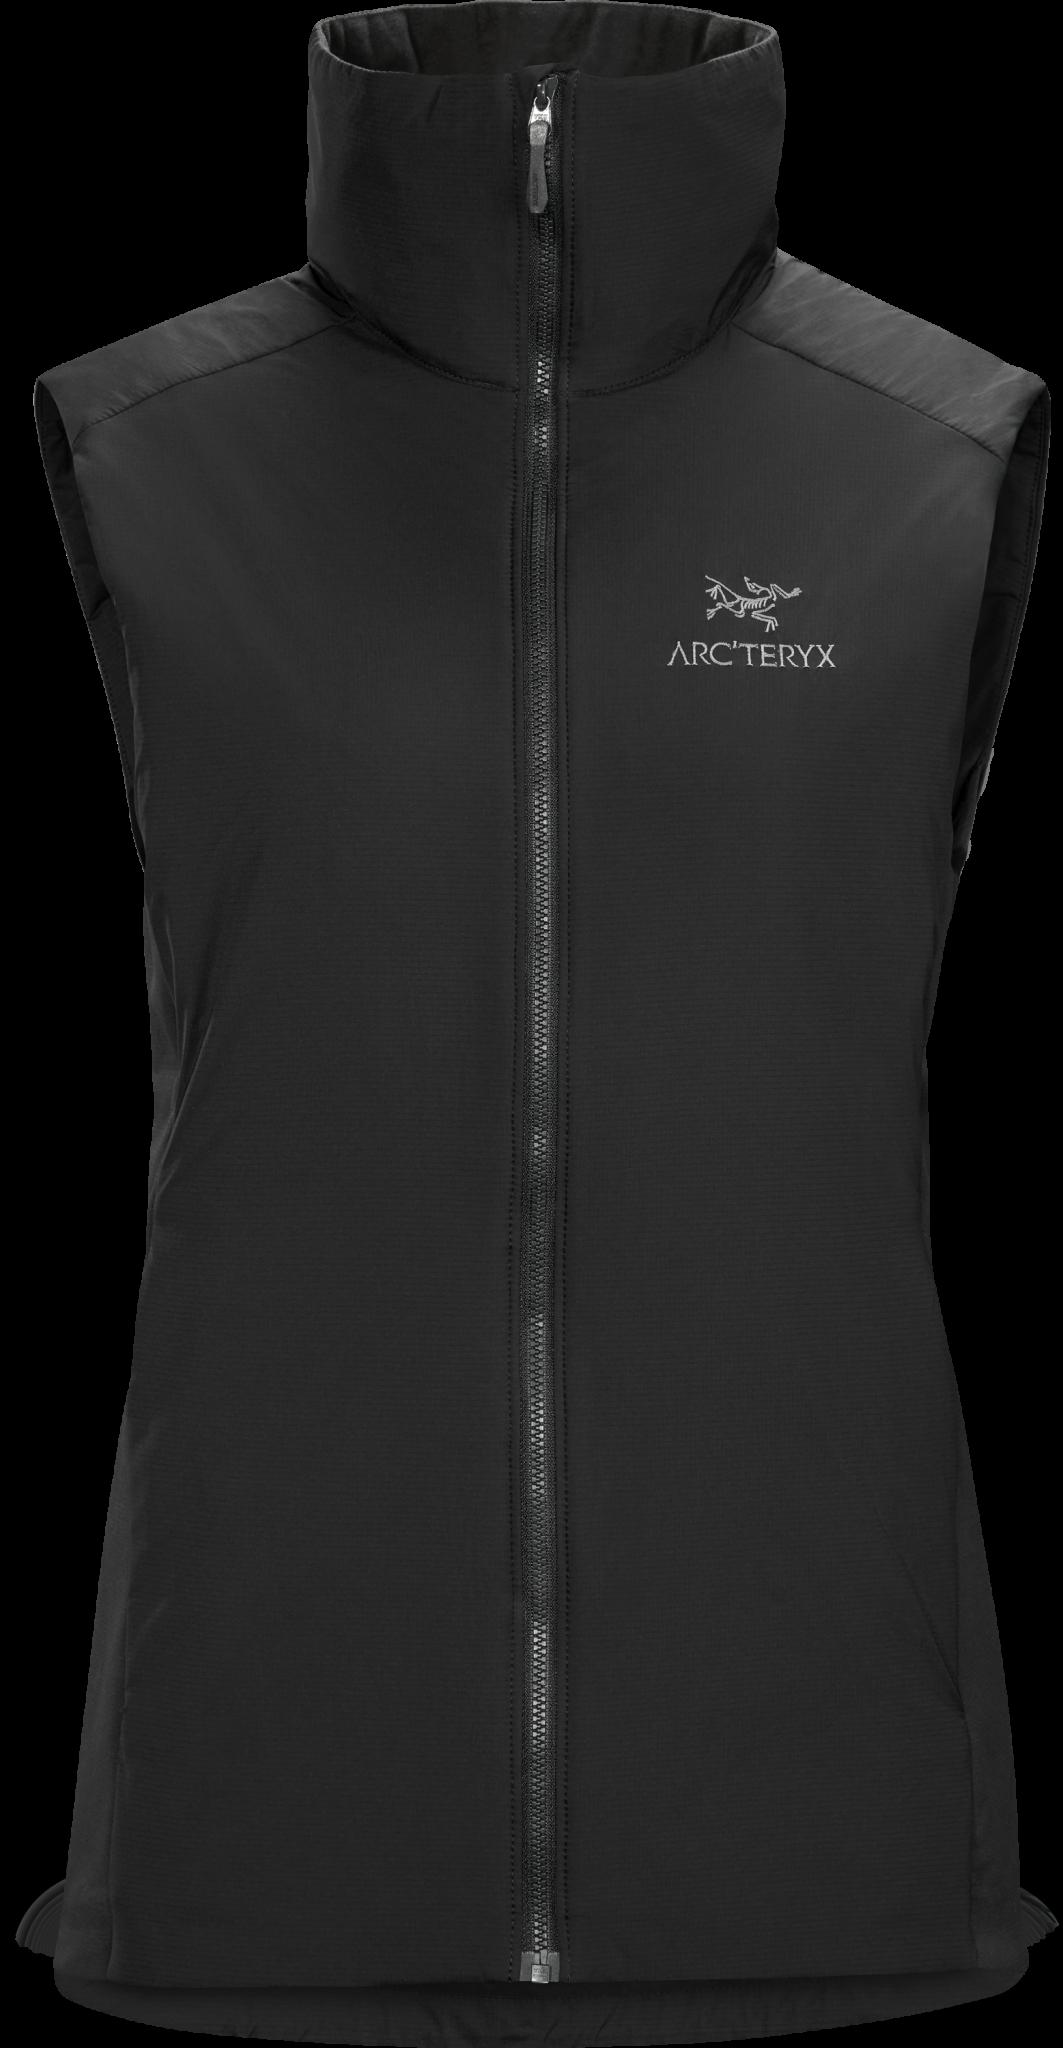 Arc'teryx Atom LT Vest Women's-1